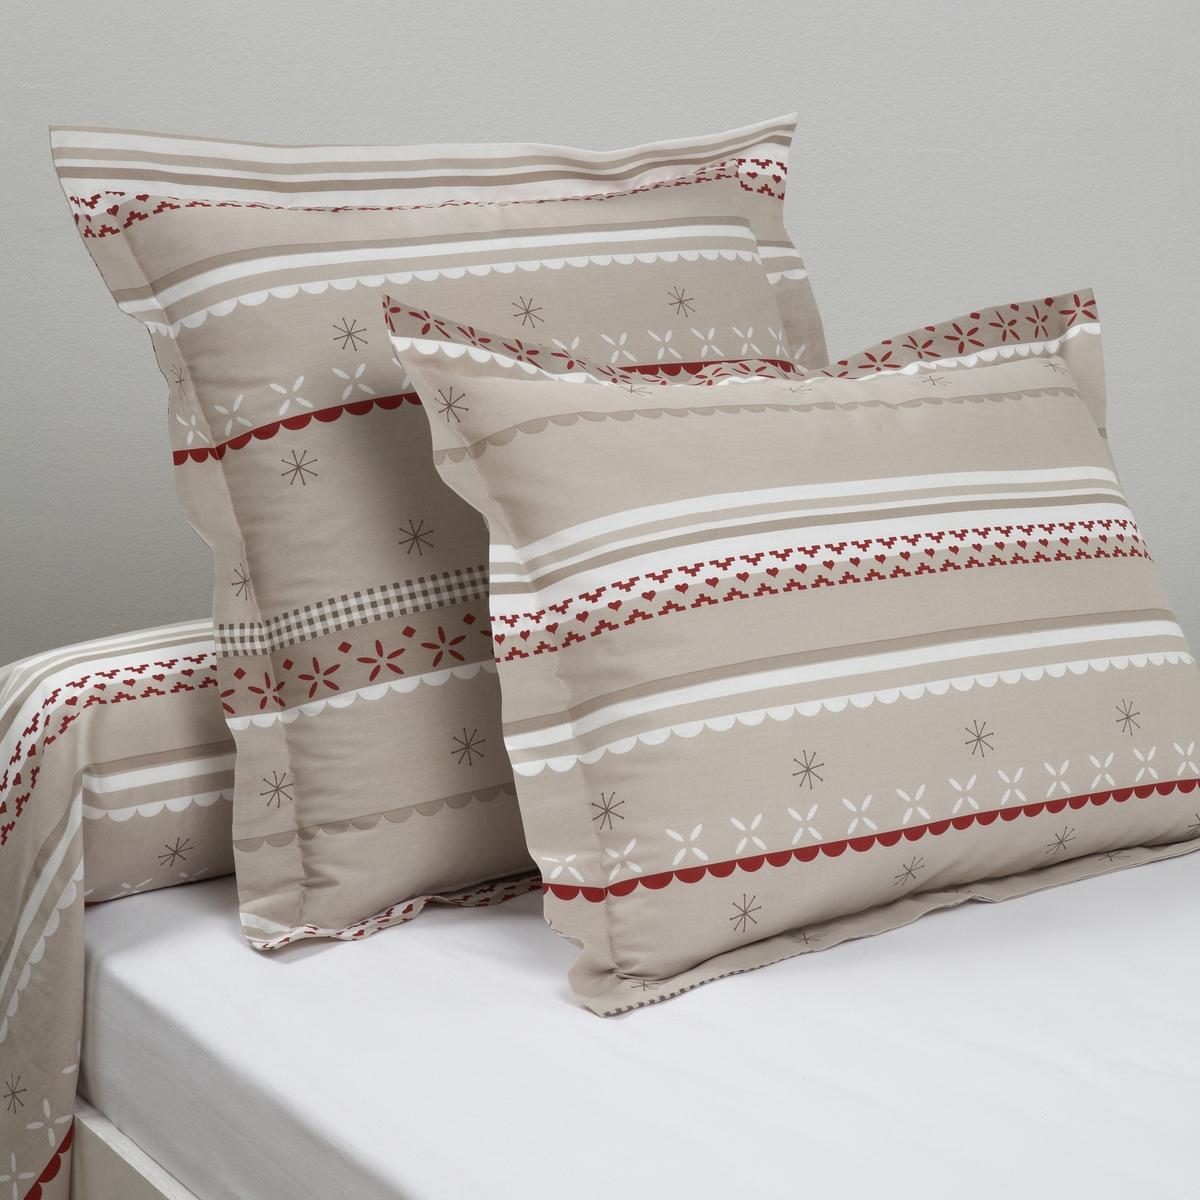 Наволочка на подушку-валик с принтом, Tyrol наволочка на подушку валик fougeras